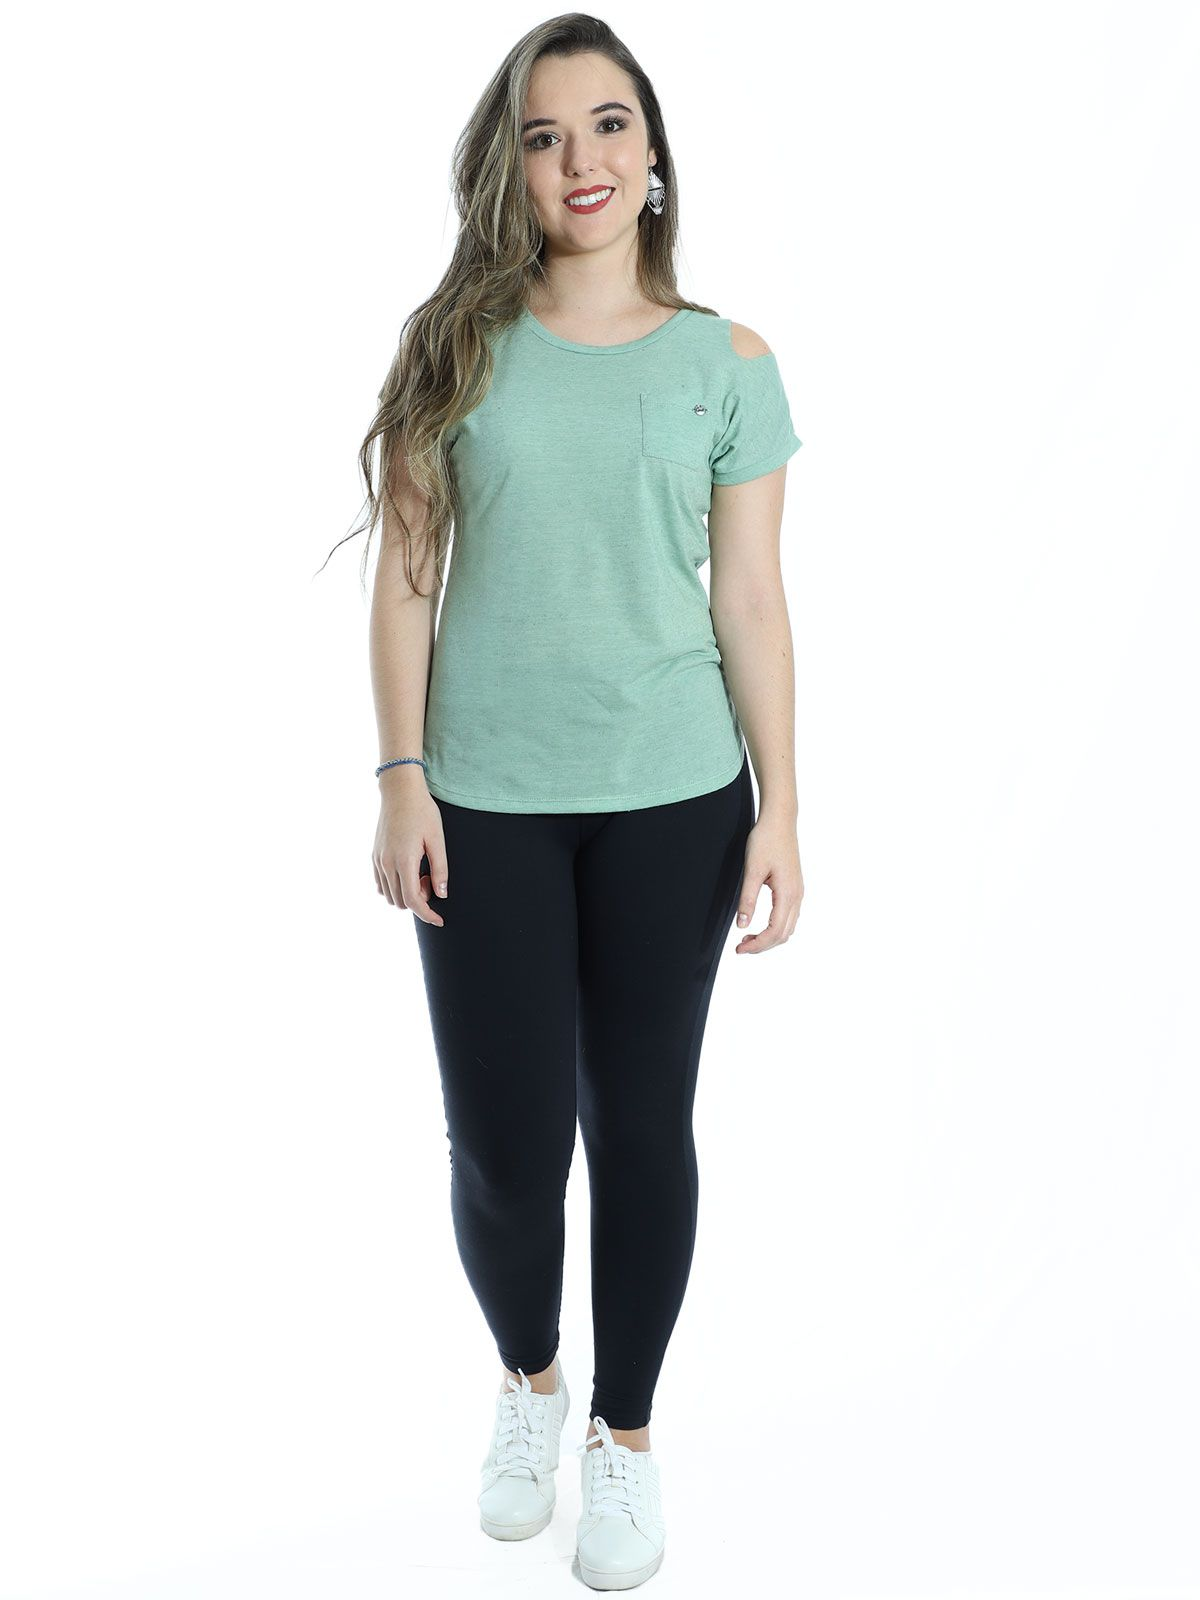 Blusa Anistia Recortes Ombro Verde